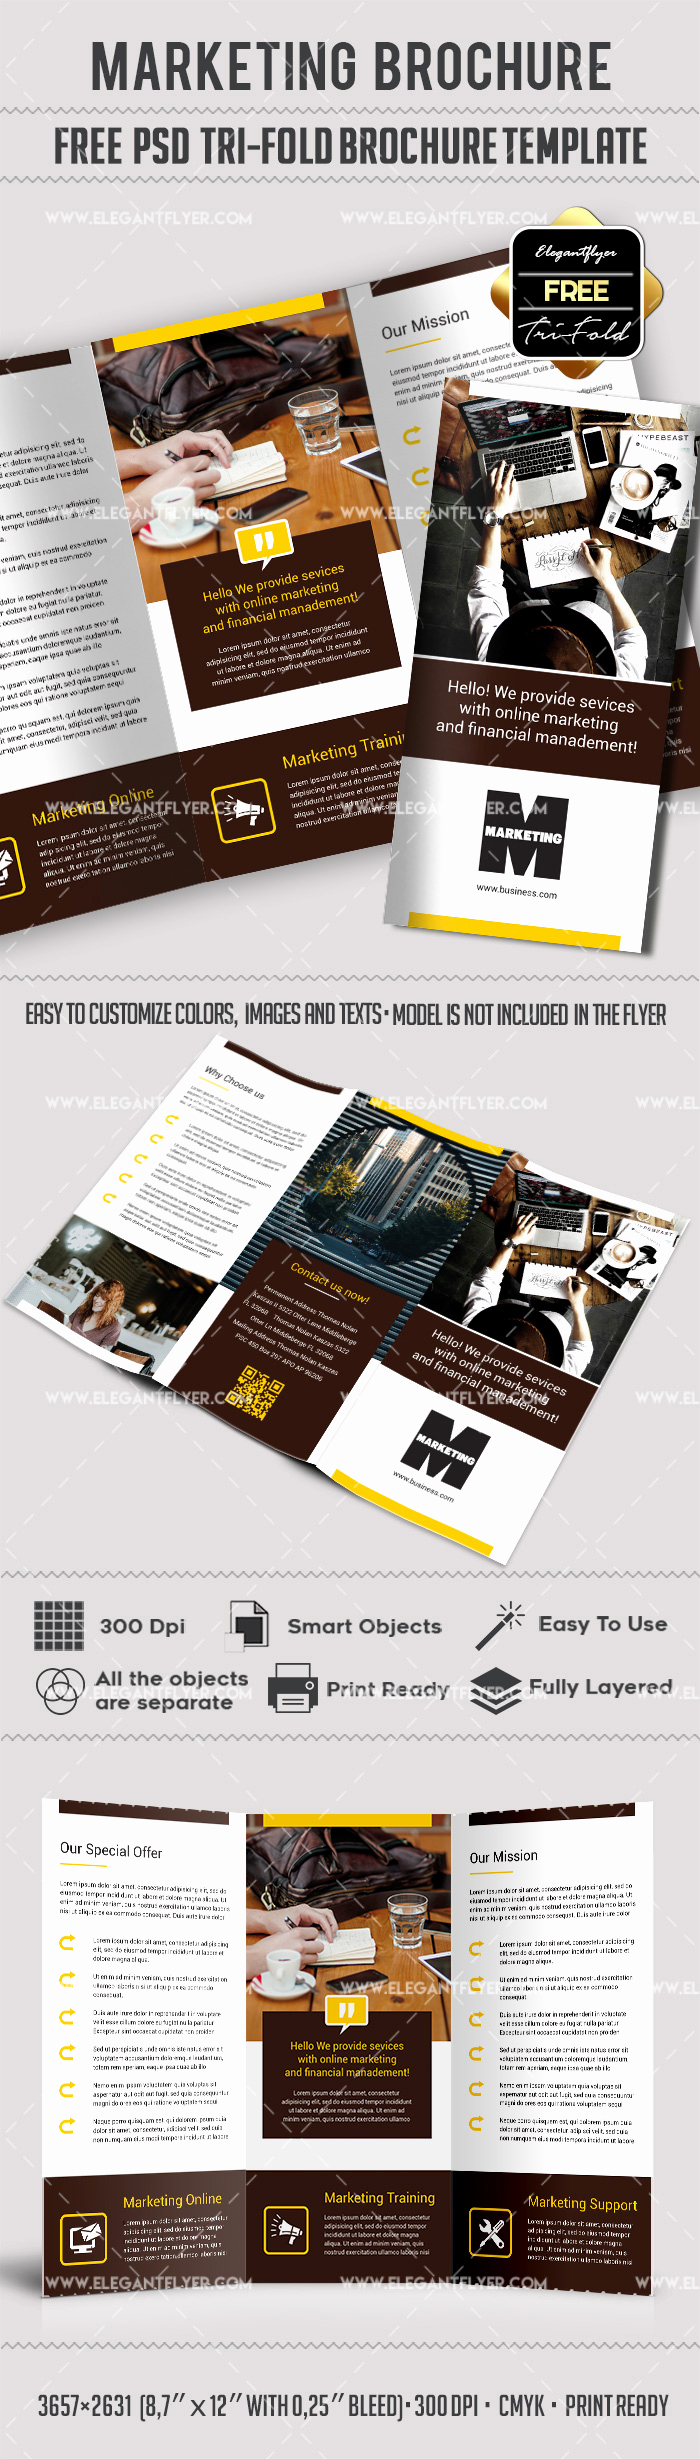 Tri Fold Brochure Template Psd Beautiful Marketing – Free Tri Fold Psd Brochure Template – by